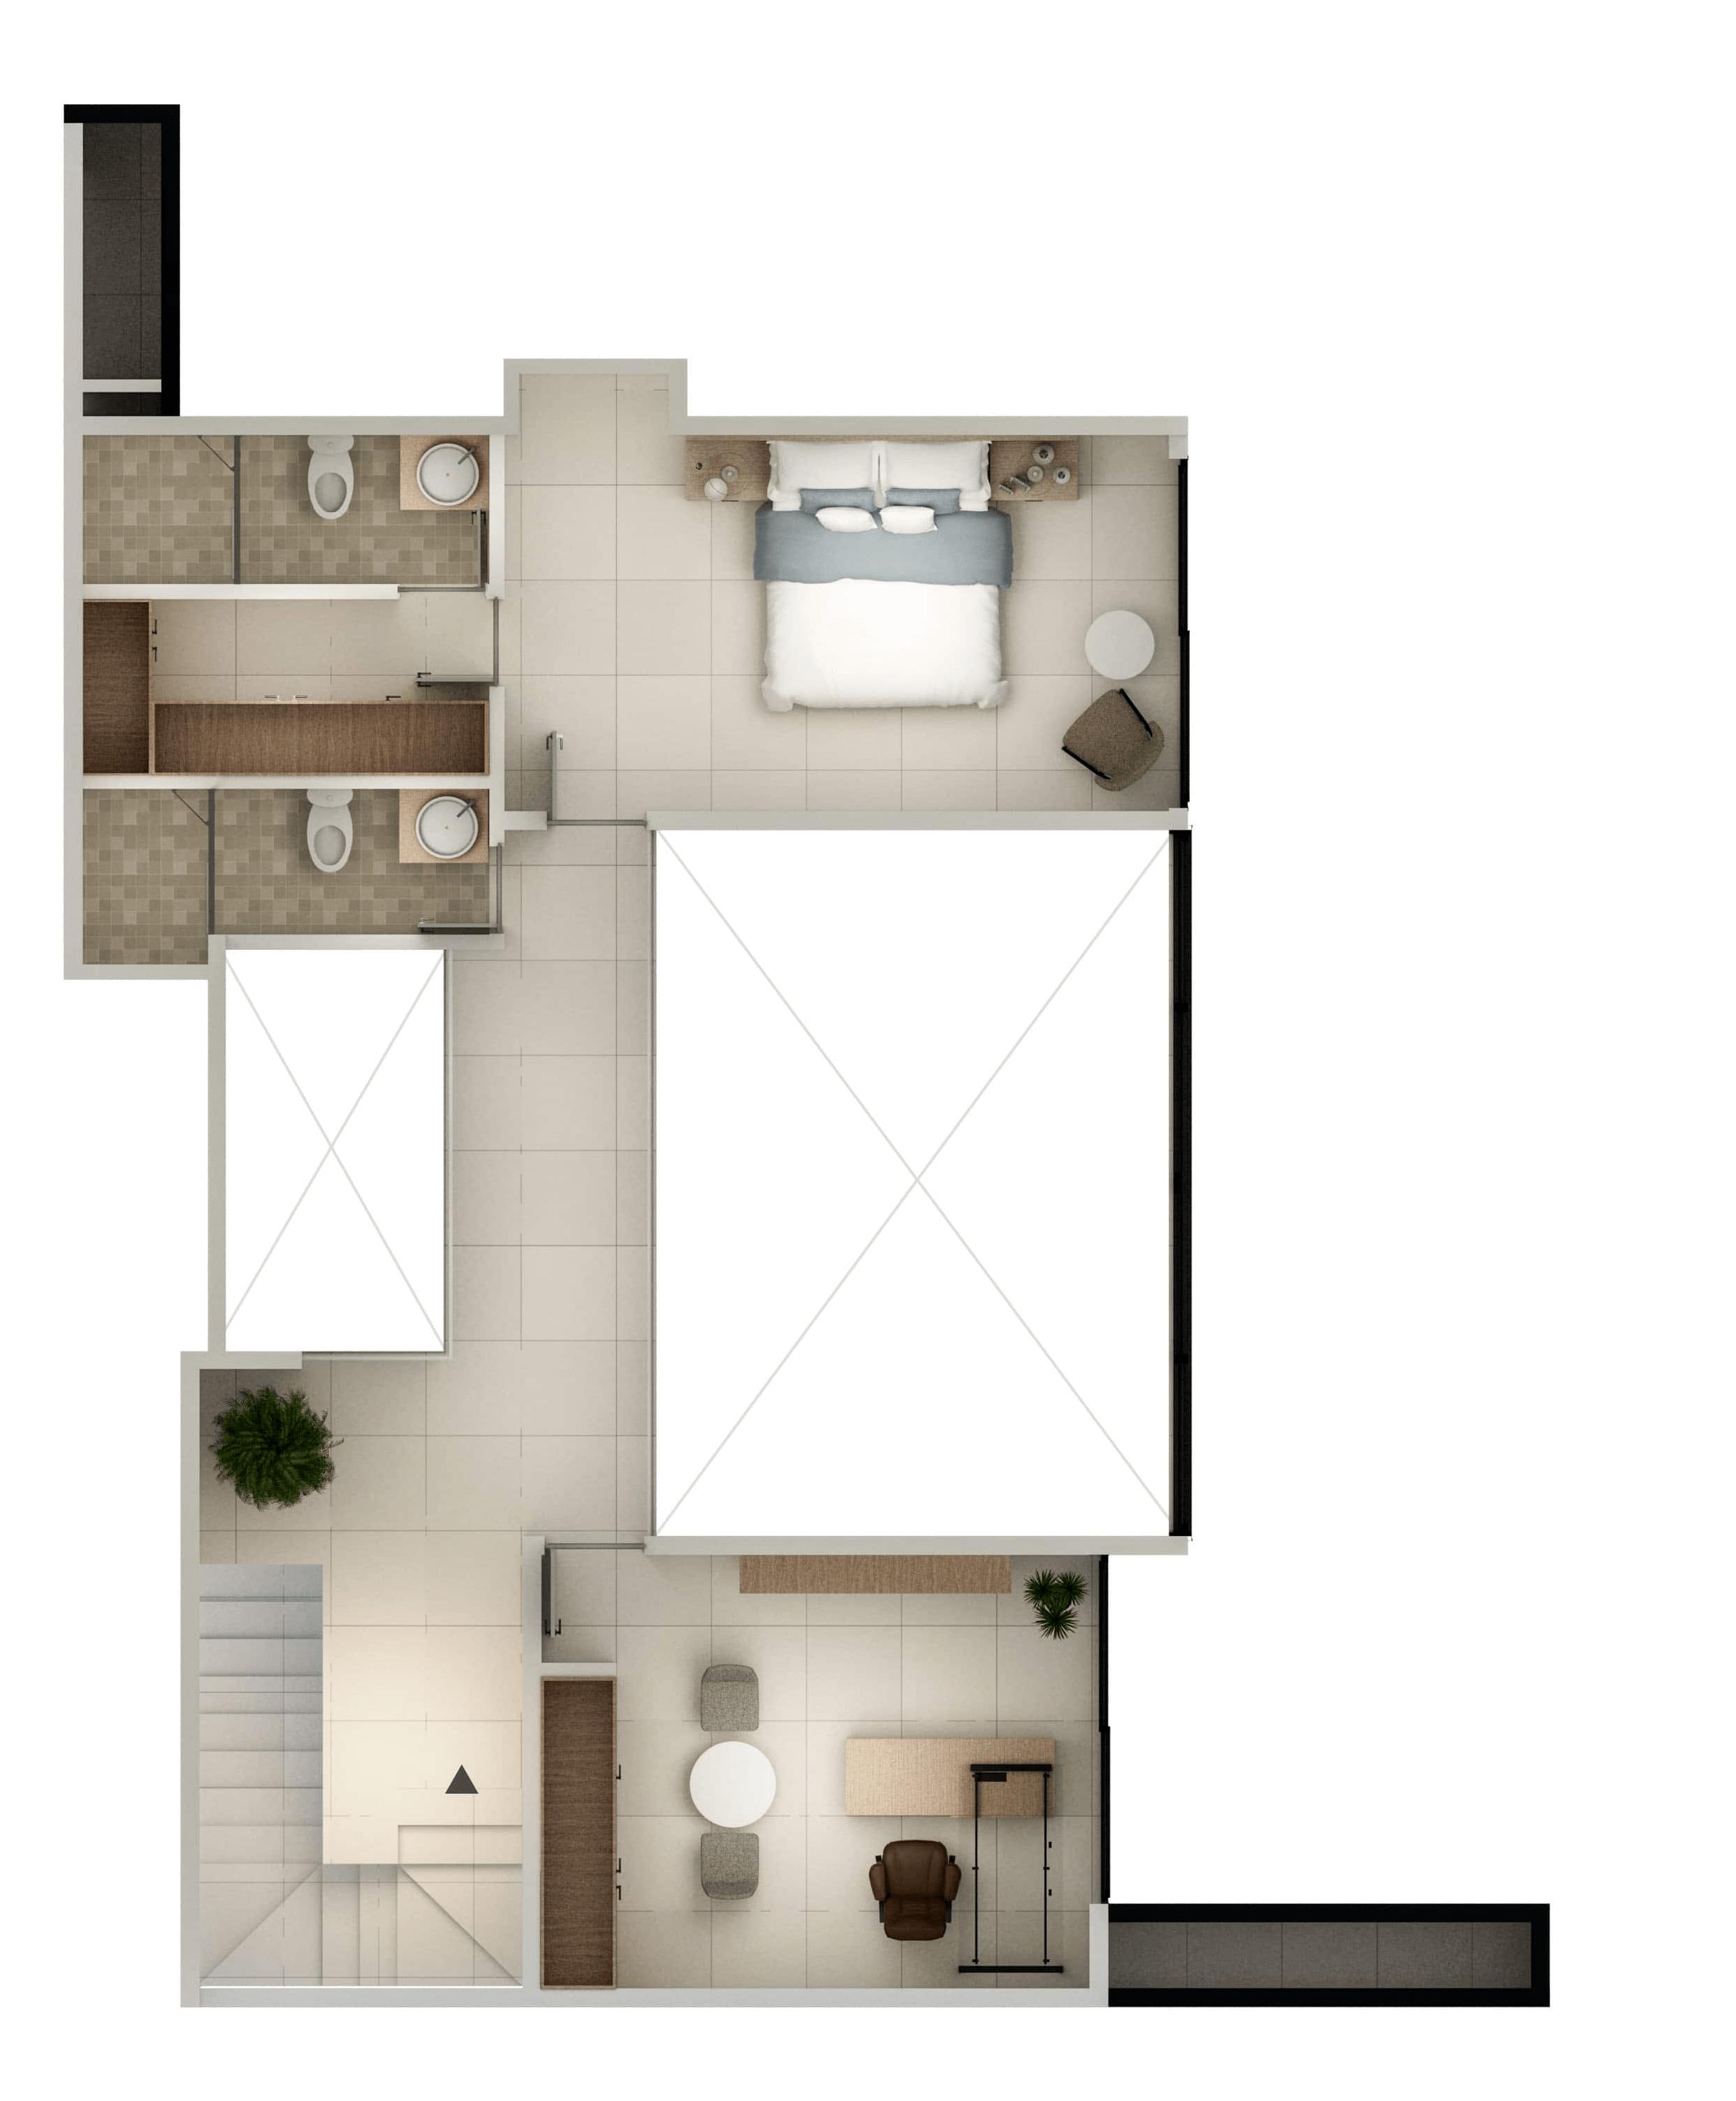 penthouse_5_alcobas_planta_1-min